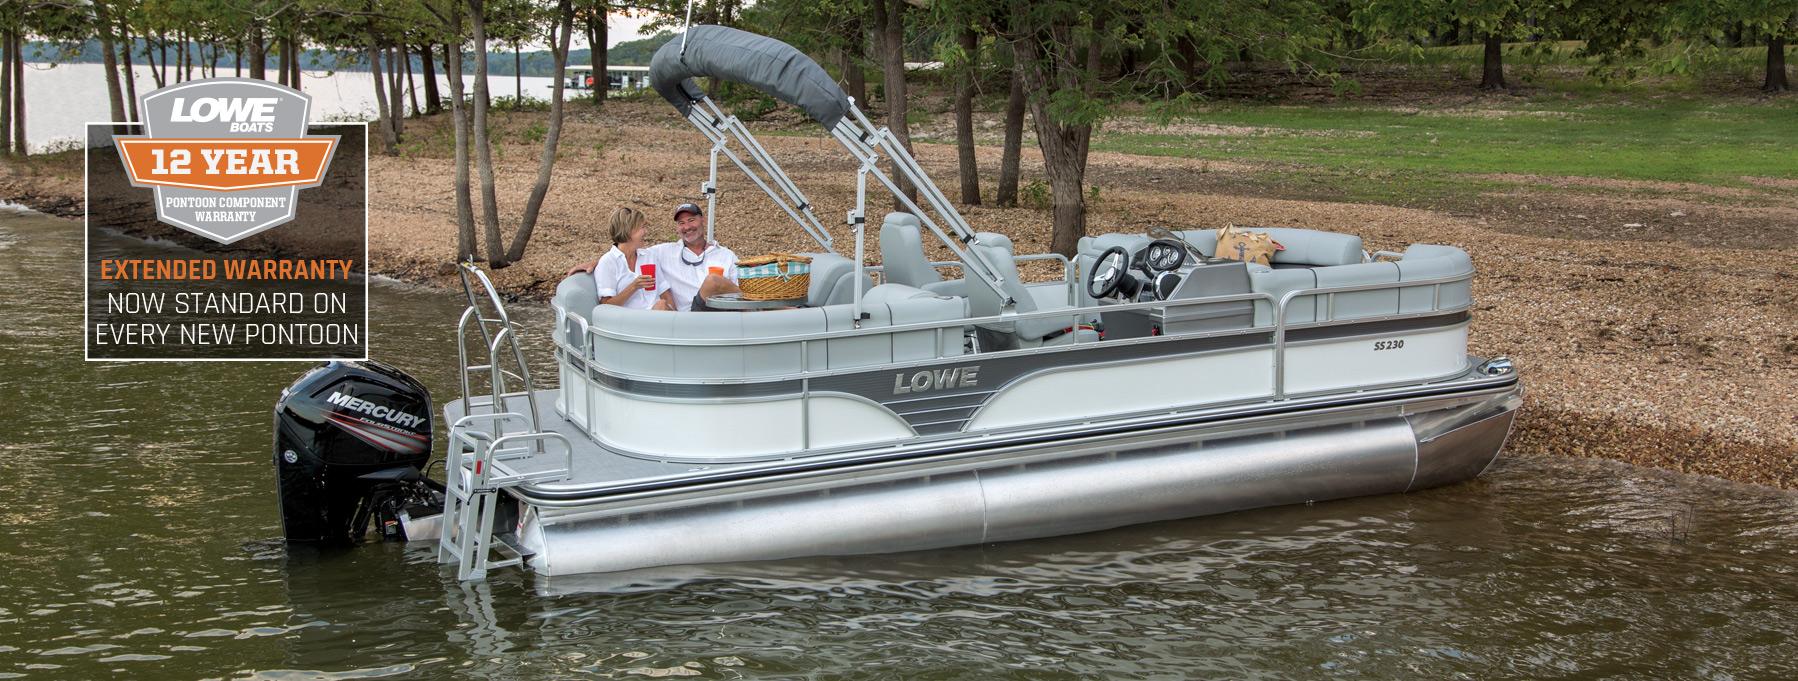 2019 SS230 Sport Pontoon Boat   Lowe Pontoons